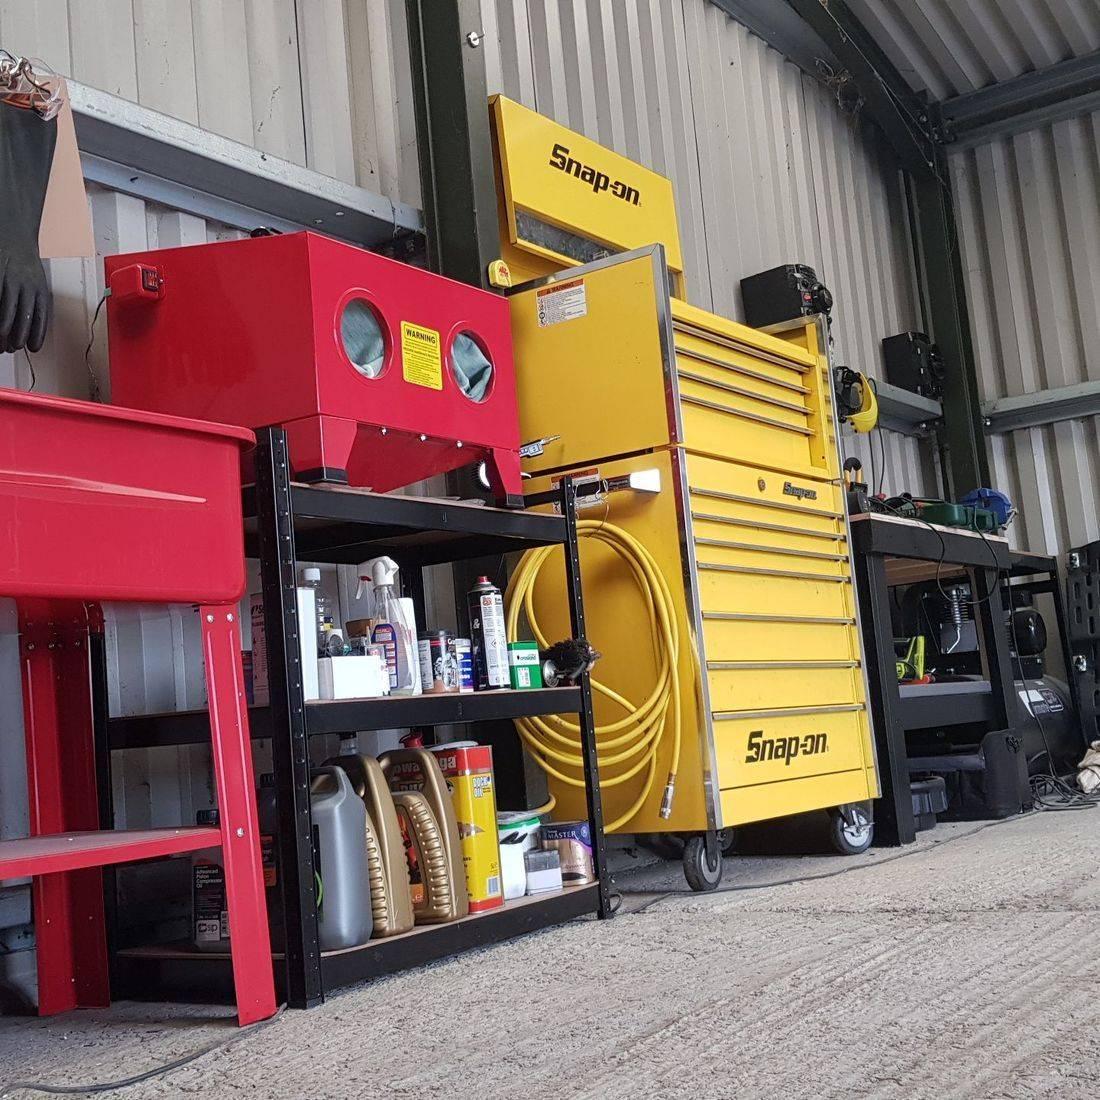 Snap-On toolbox, Garage equipment, car service Martock